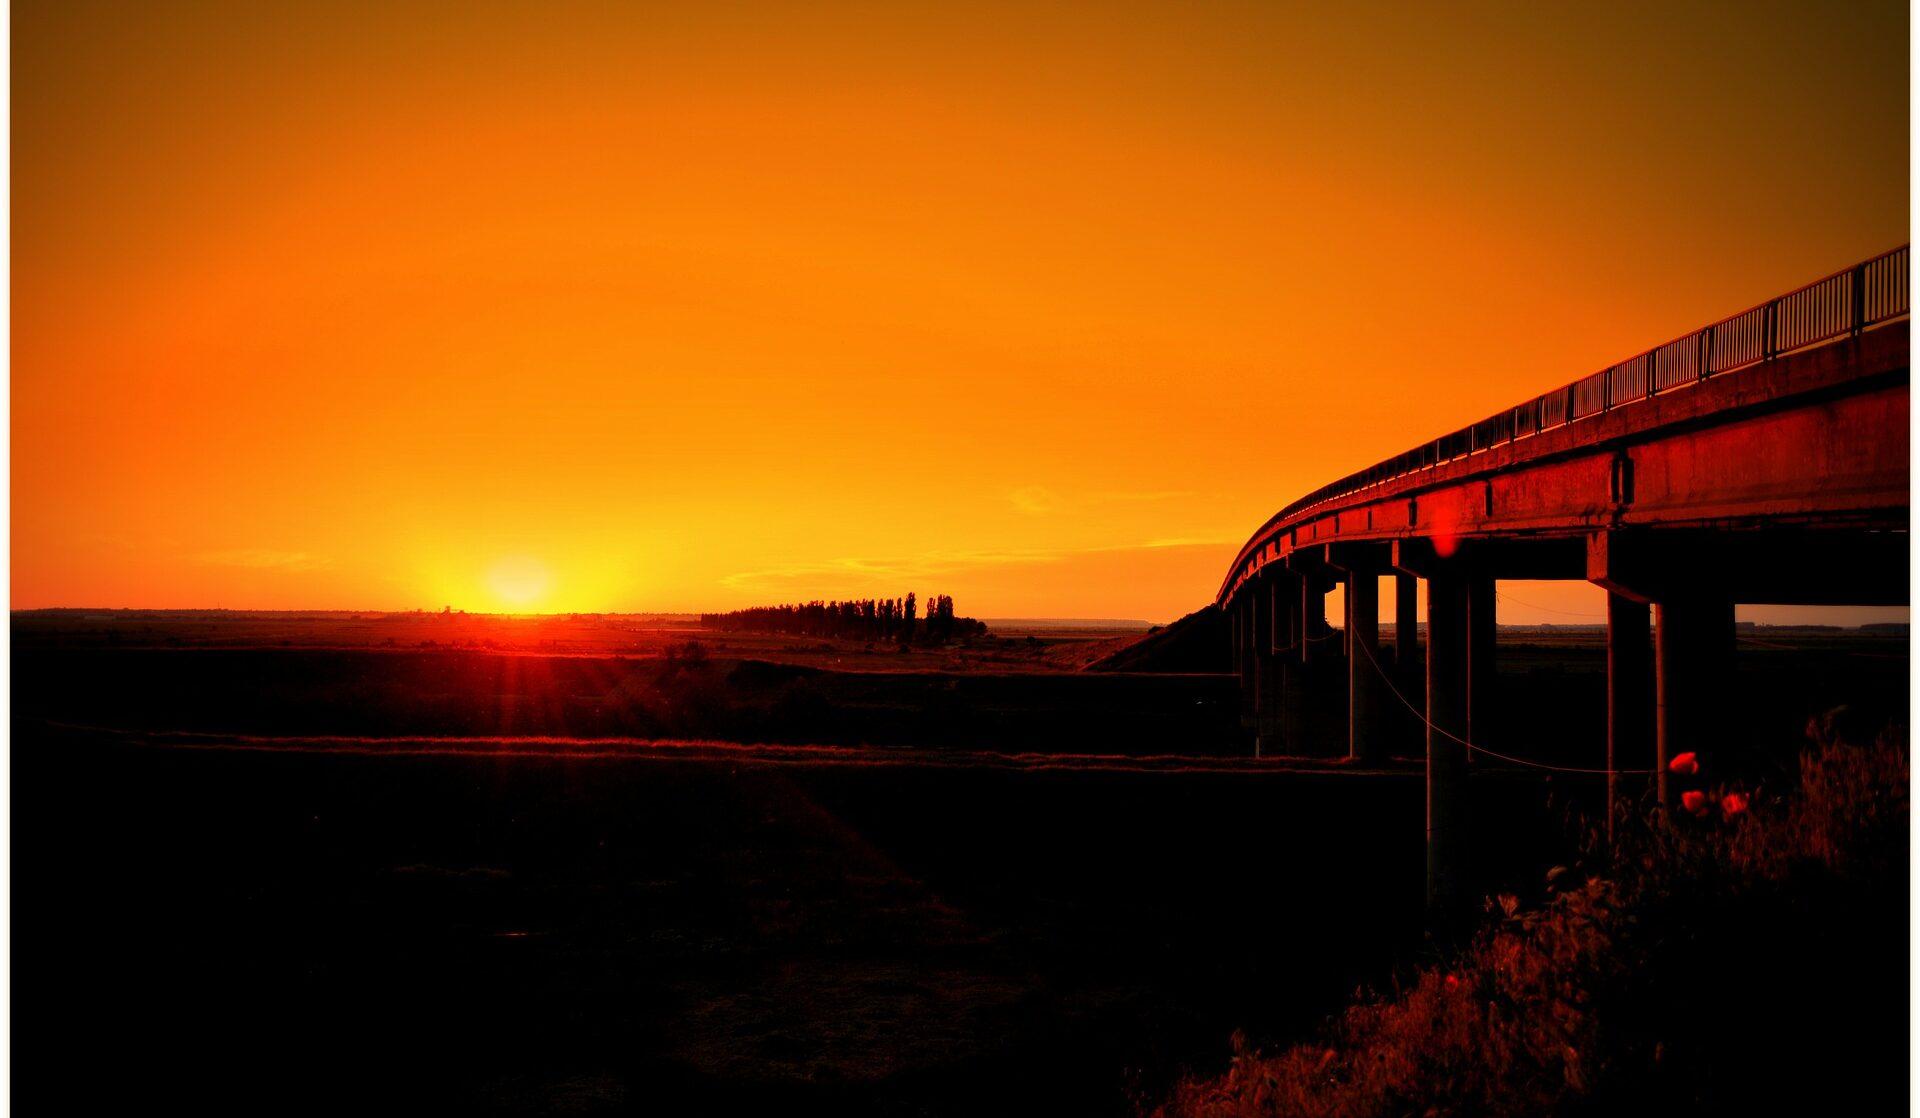 sunset-477857_1920